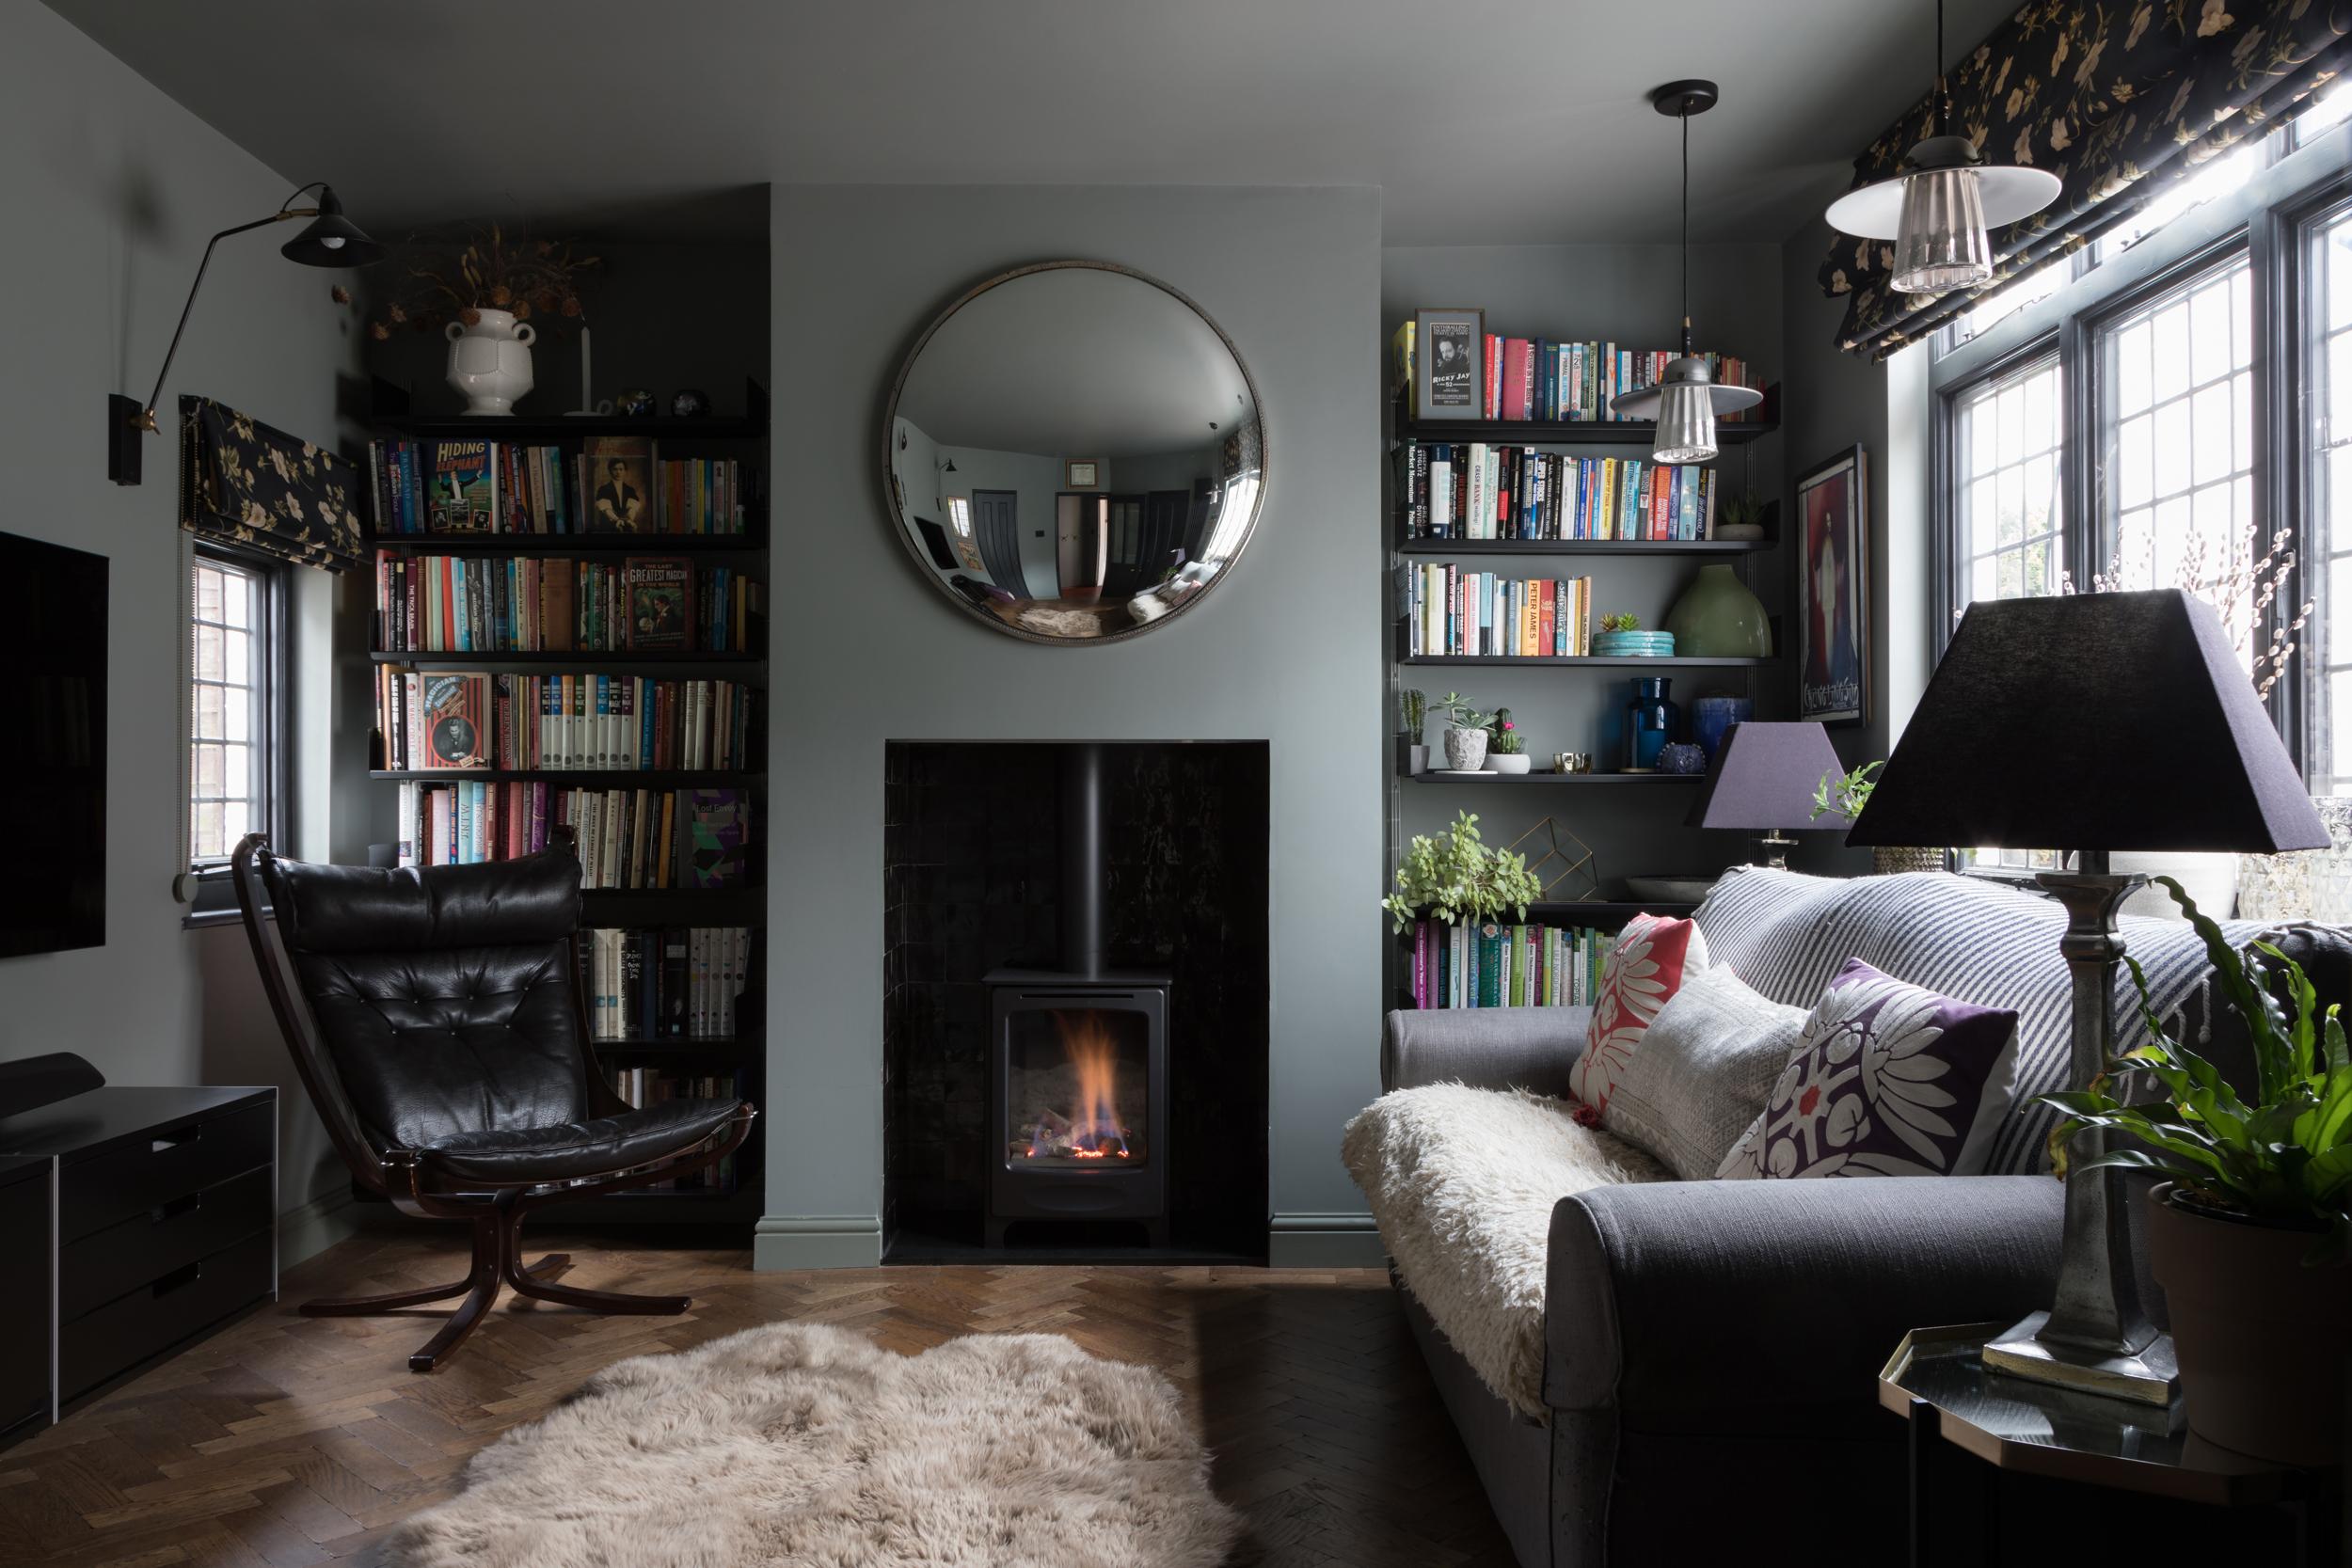 snug-tv-room-design-by-alison-anderson-interiors.jpg